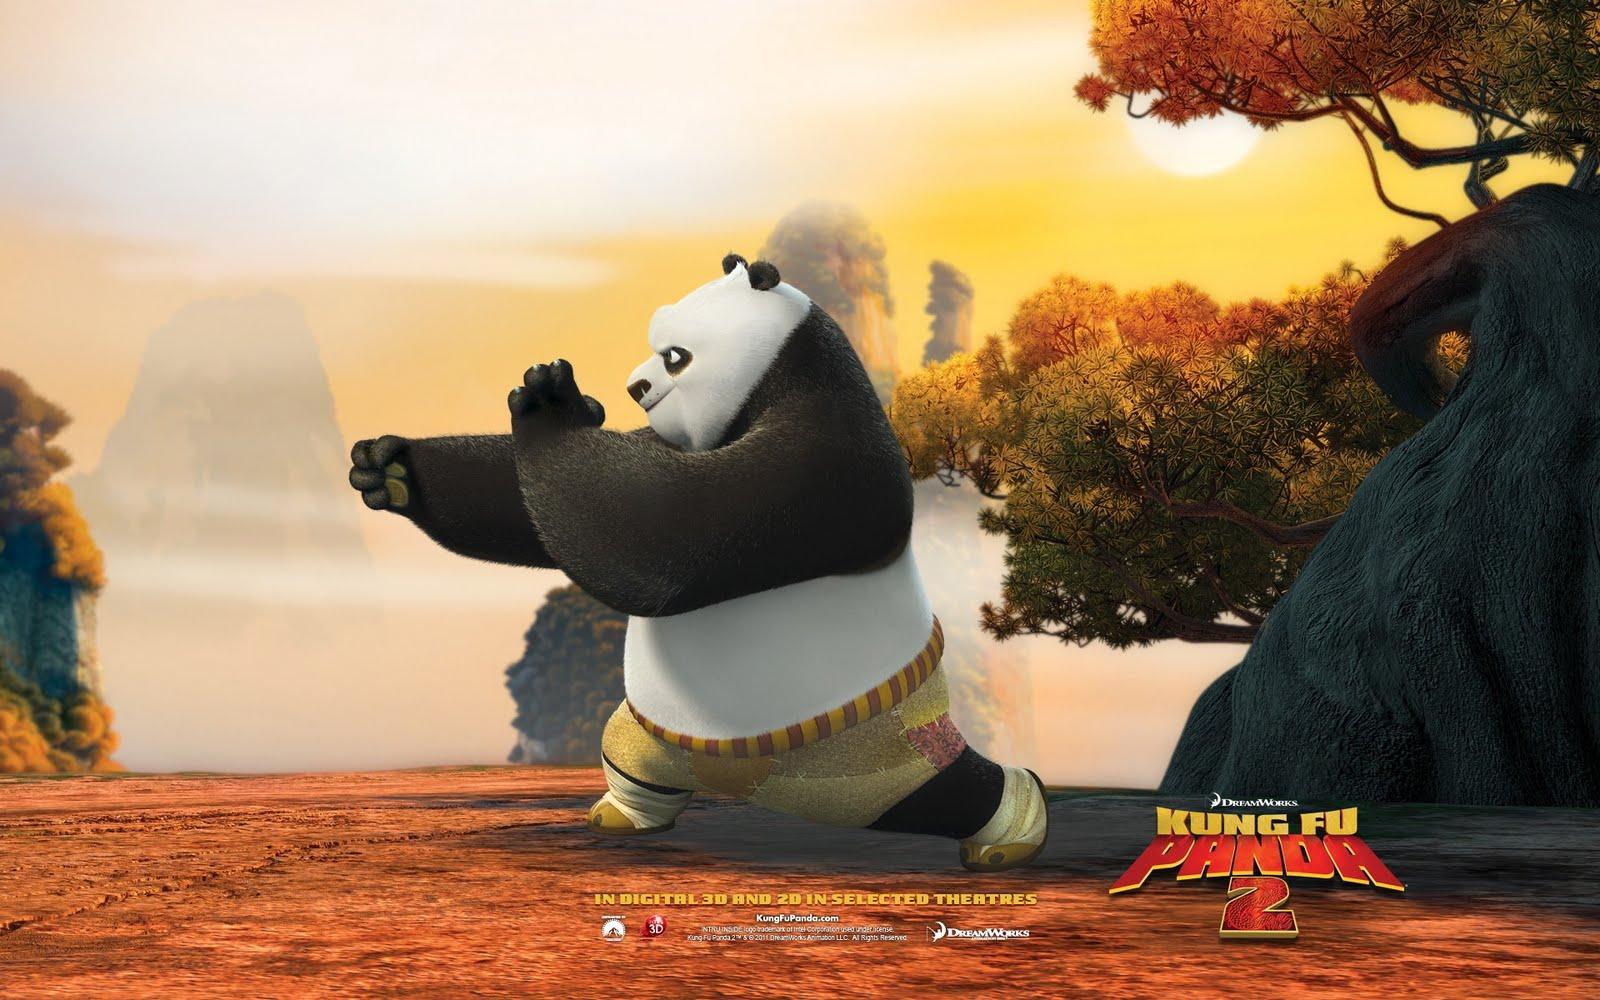 http://2.bp.blogspot.com/-pmEE2jzrIZU/Tdup9ZqymWI/AAAAAAAACDw/d6oR8LCbNLQ/s1600/Kung+Fu+Panda+2+Wallpaper+5.jpg